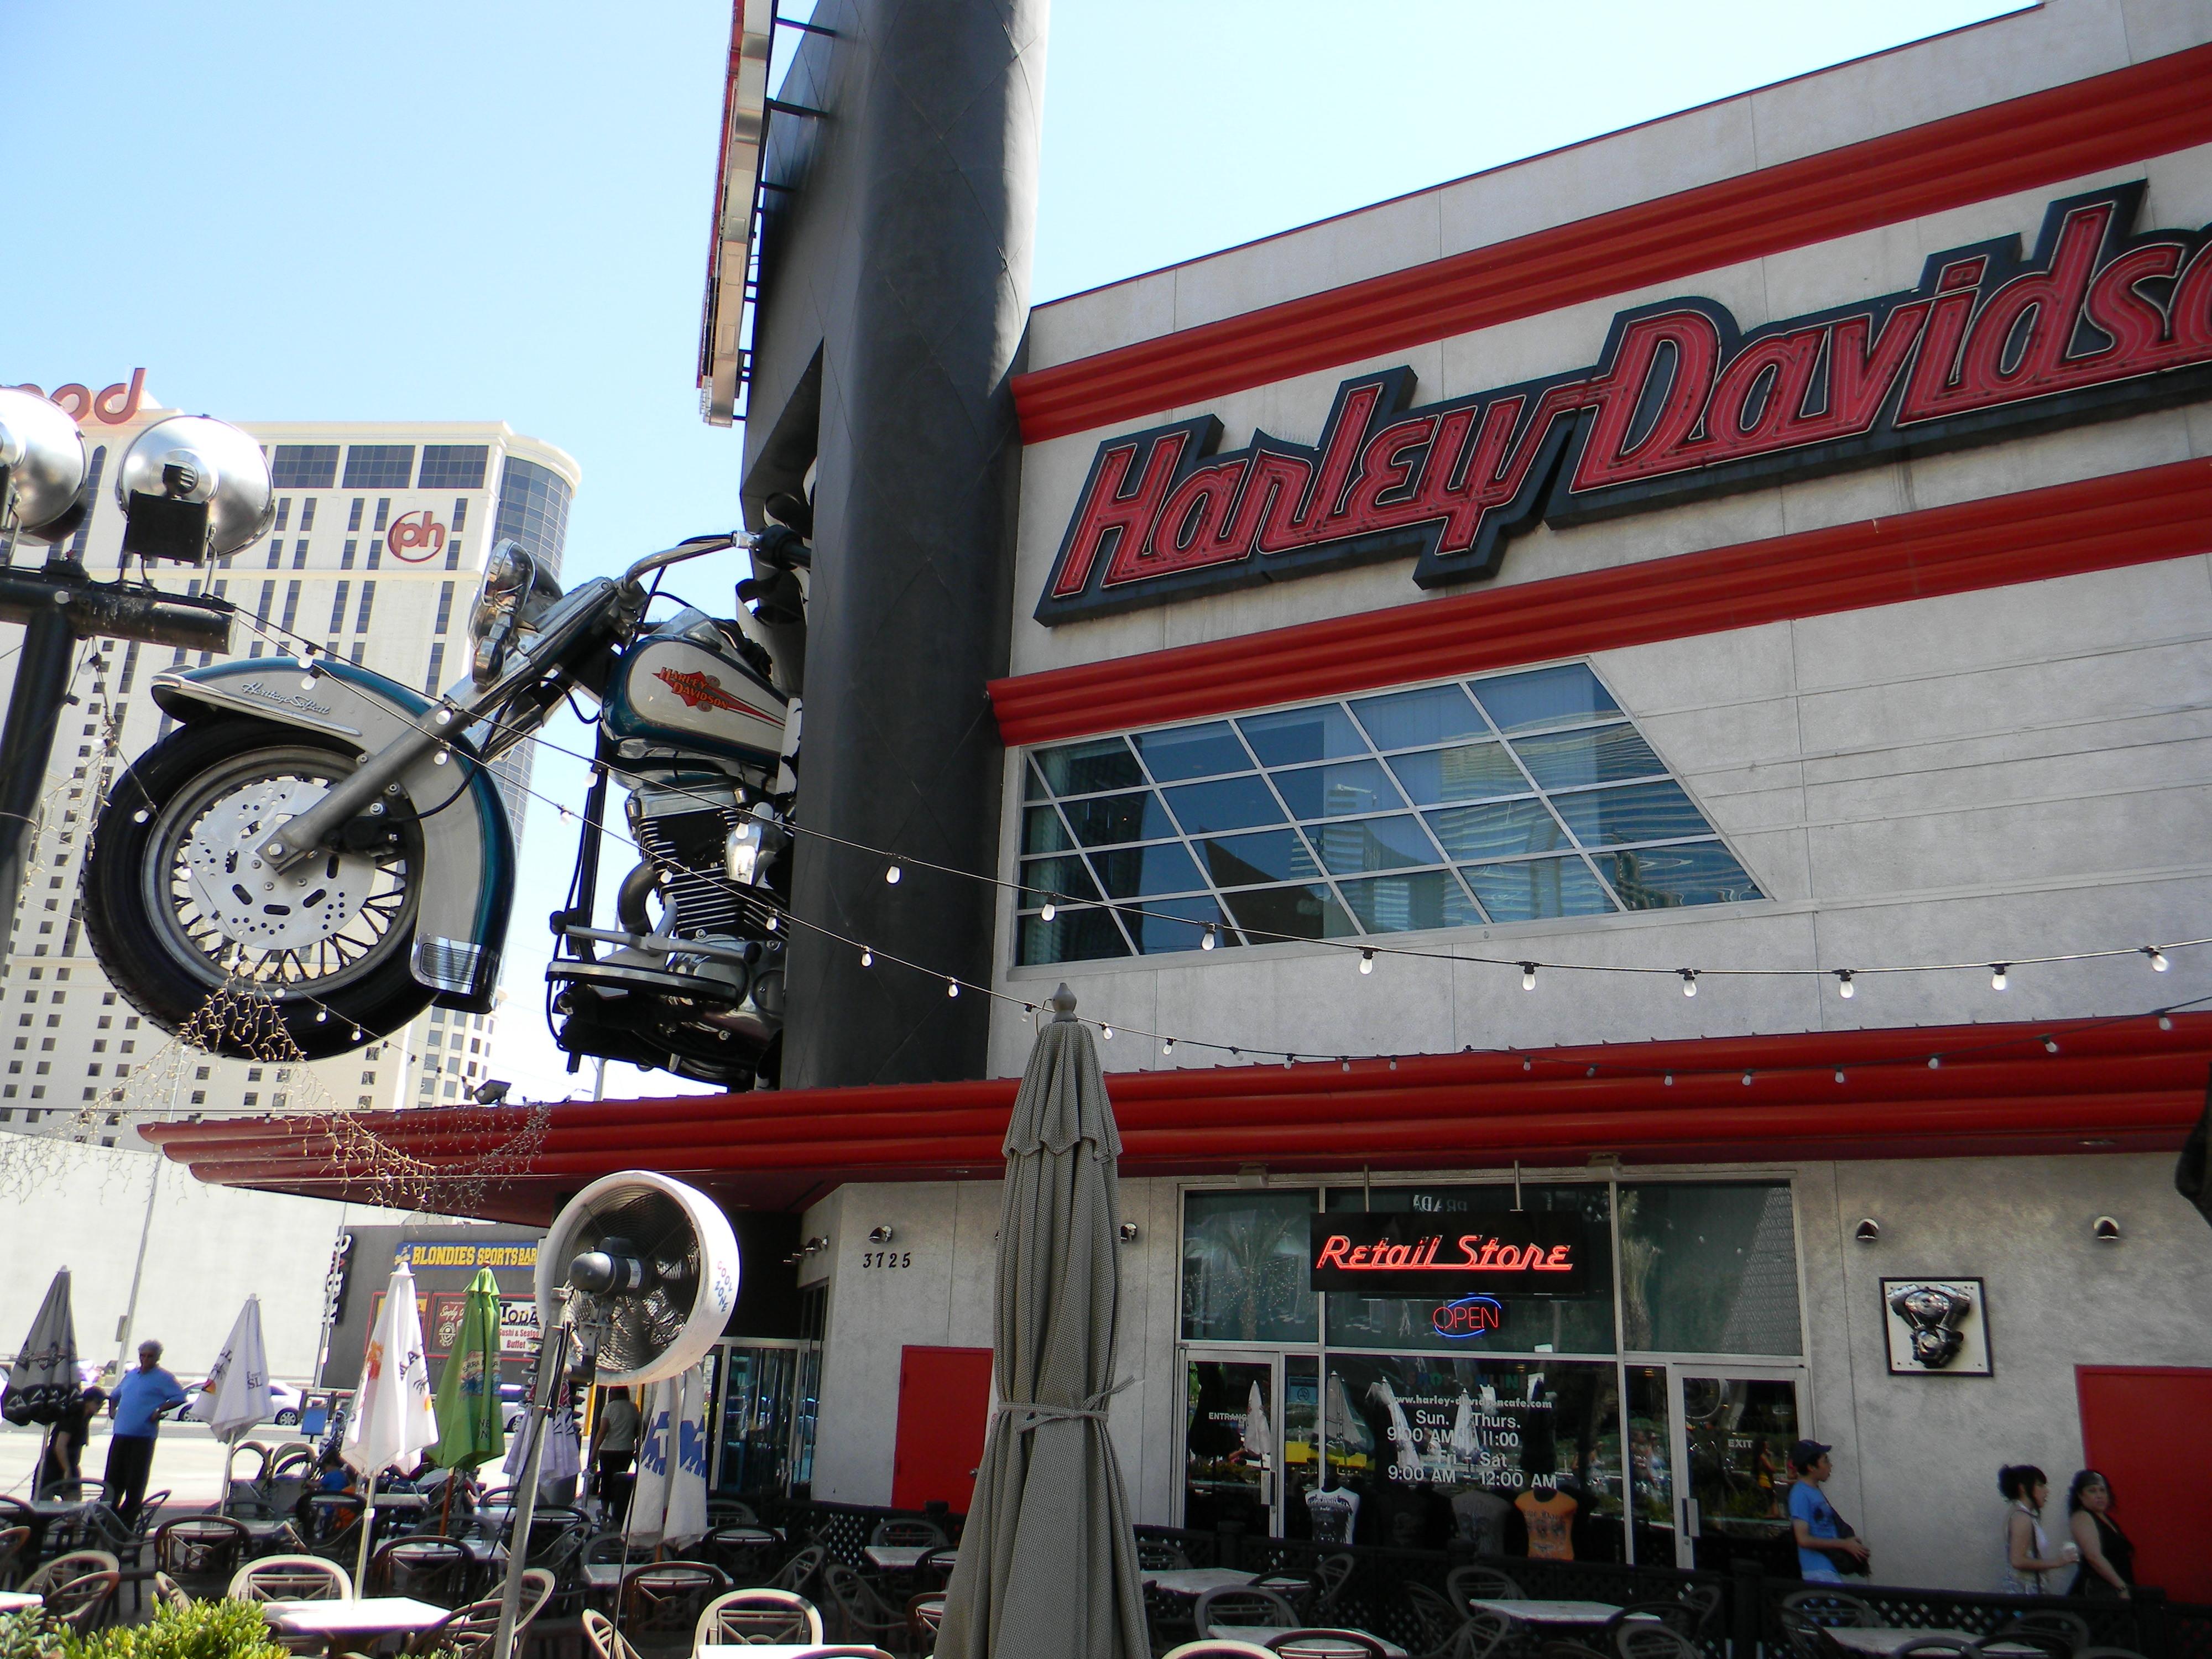 Harley Davidson Cafe New York Restaurant